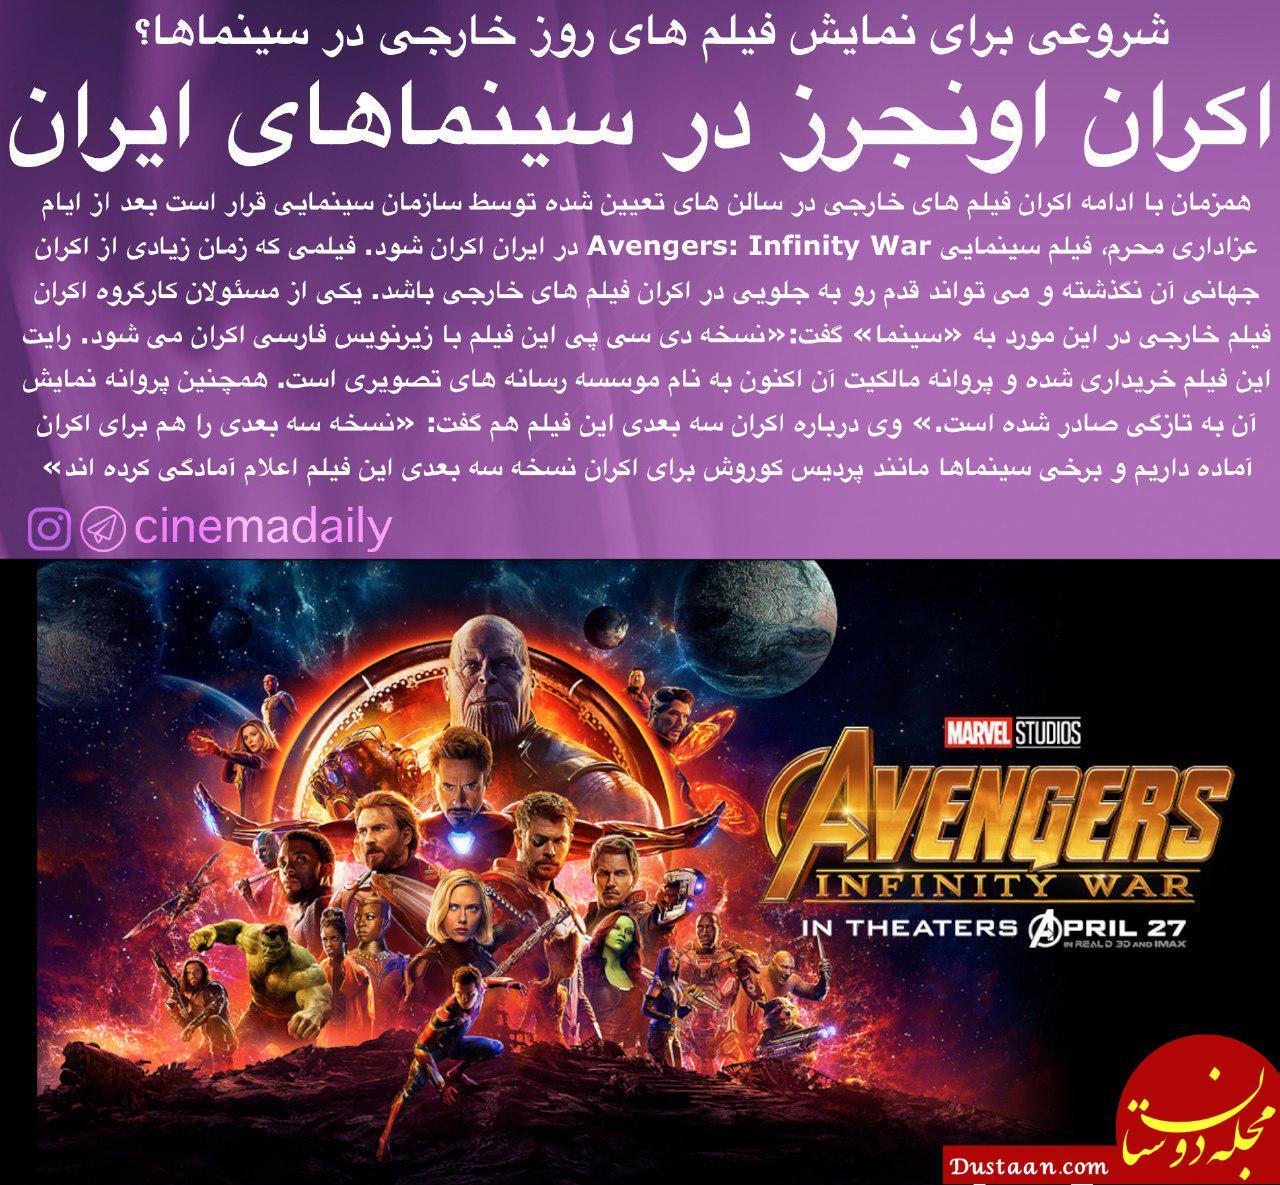 www.dustaan.com اکران قسمت تازه اونجرز در ایران